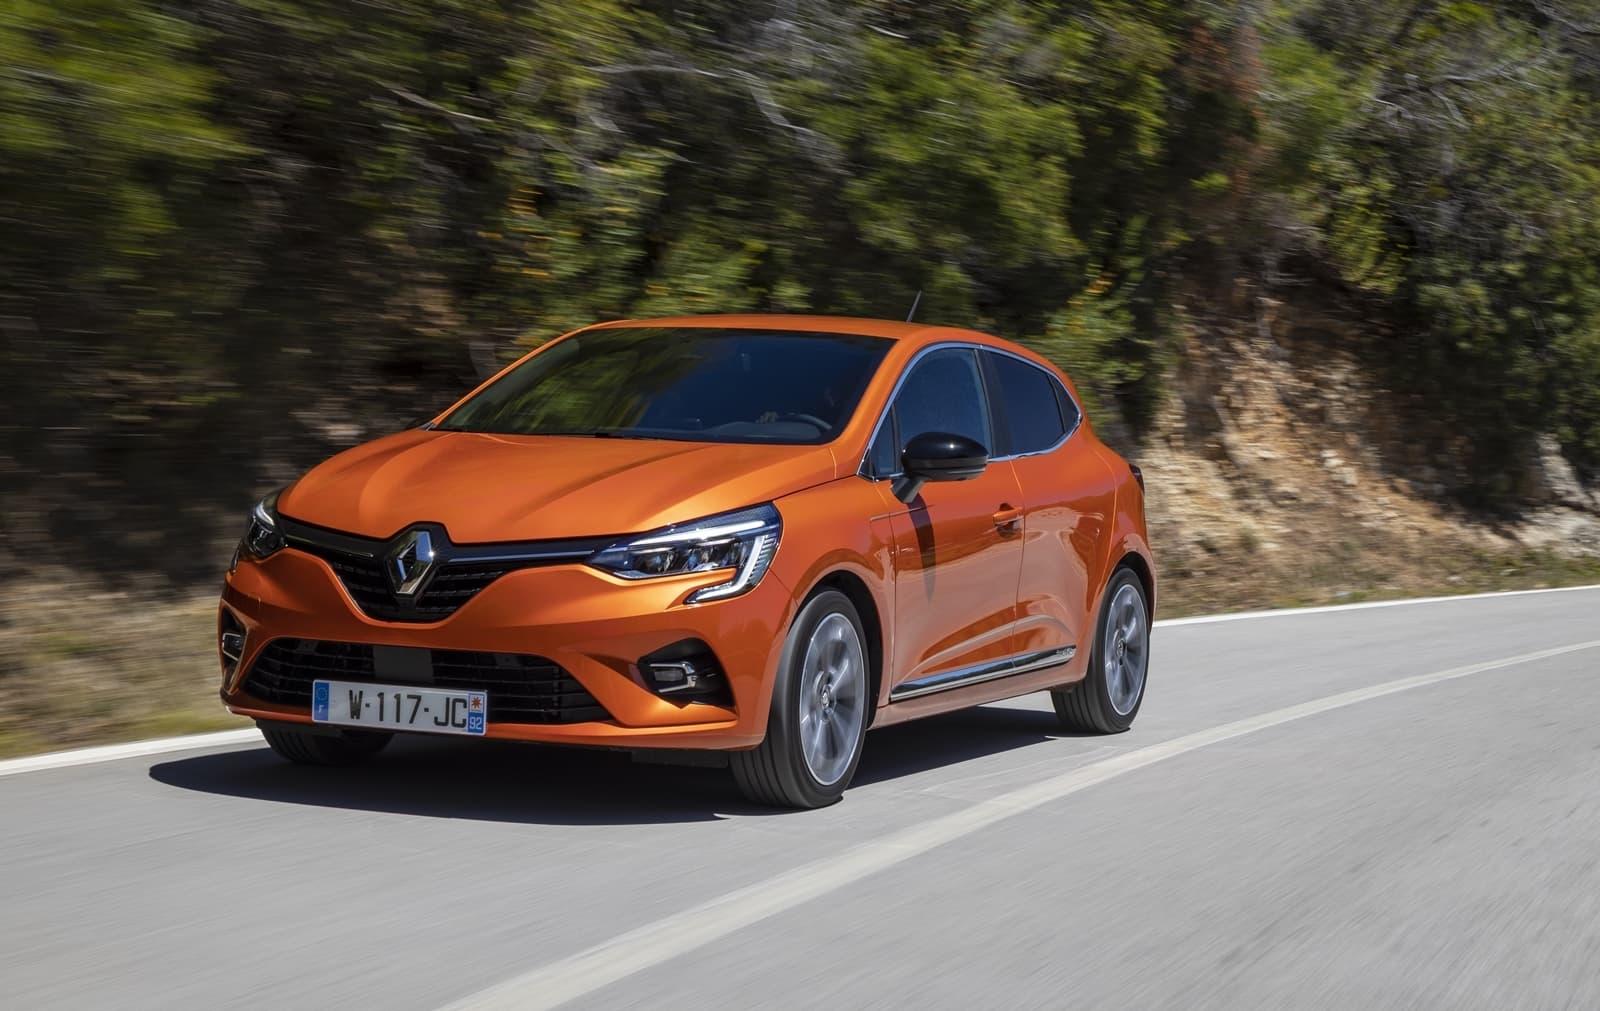 Renault Clio 2020 Prueba 0619 006